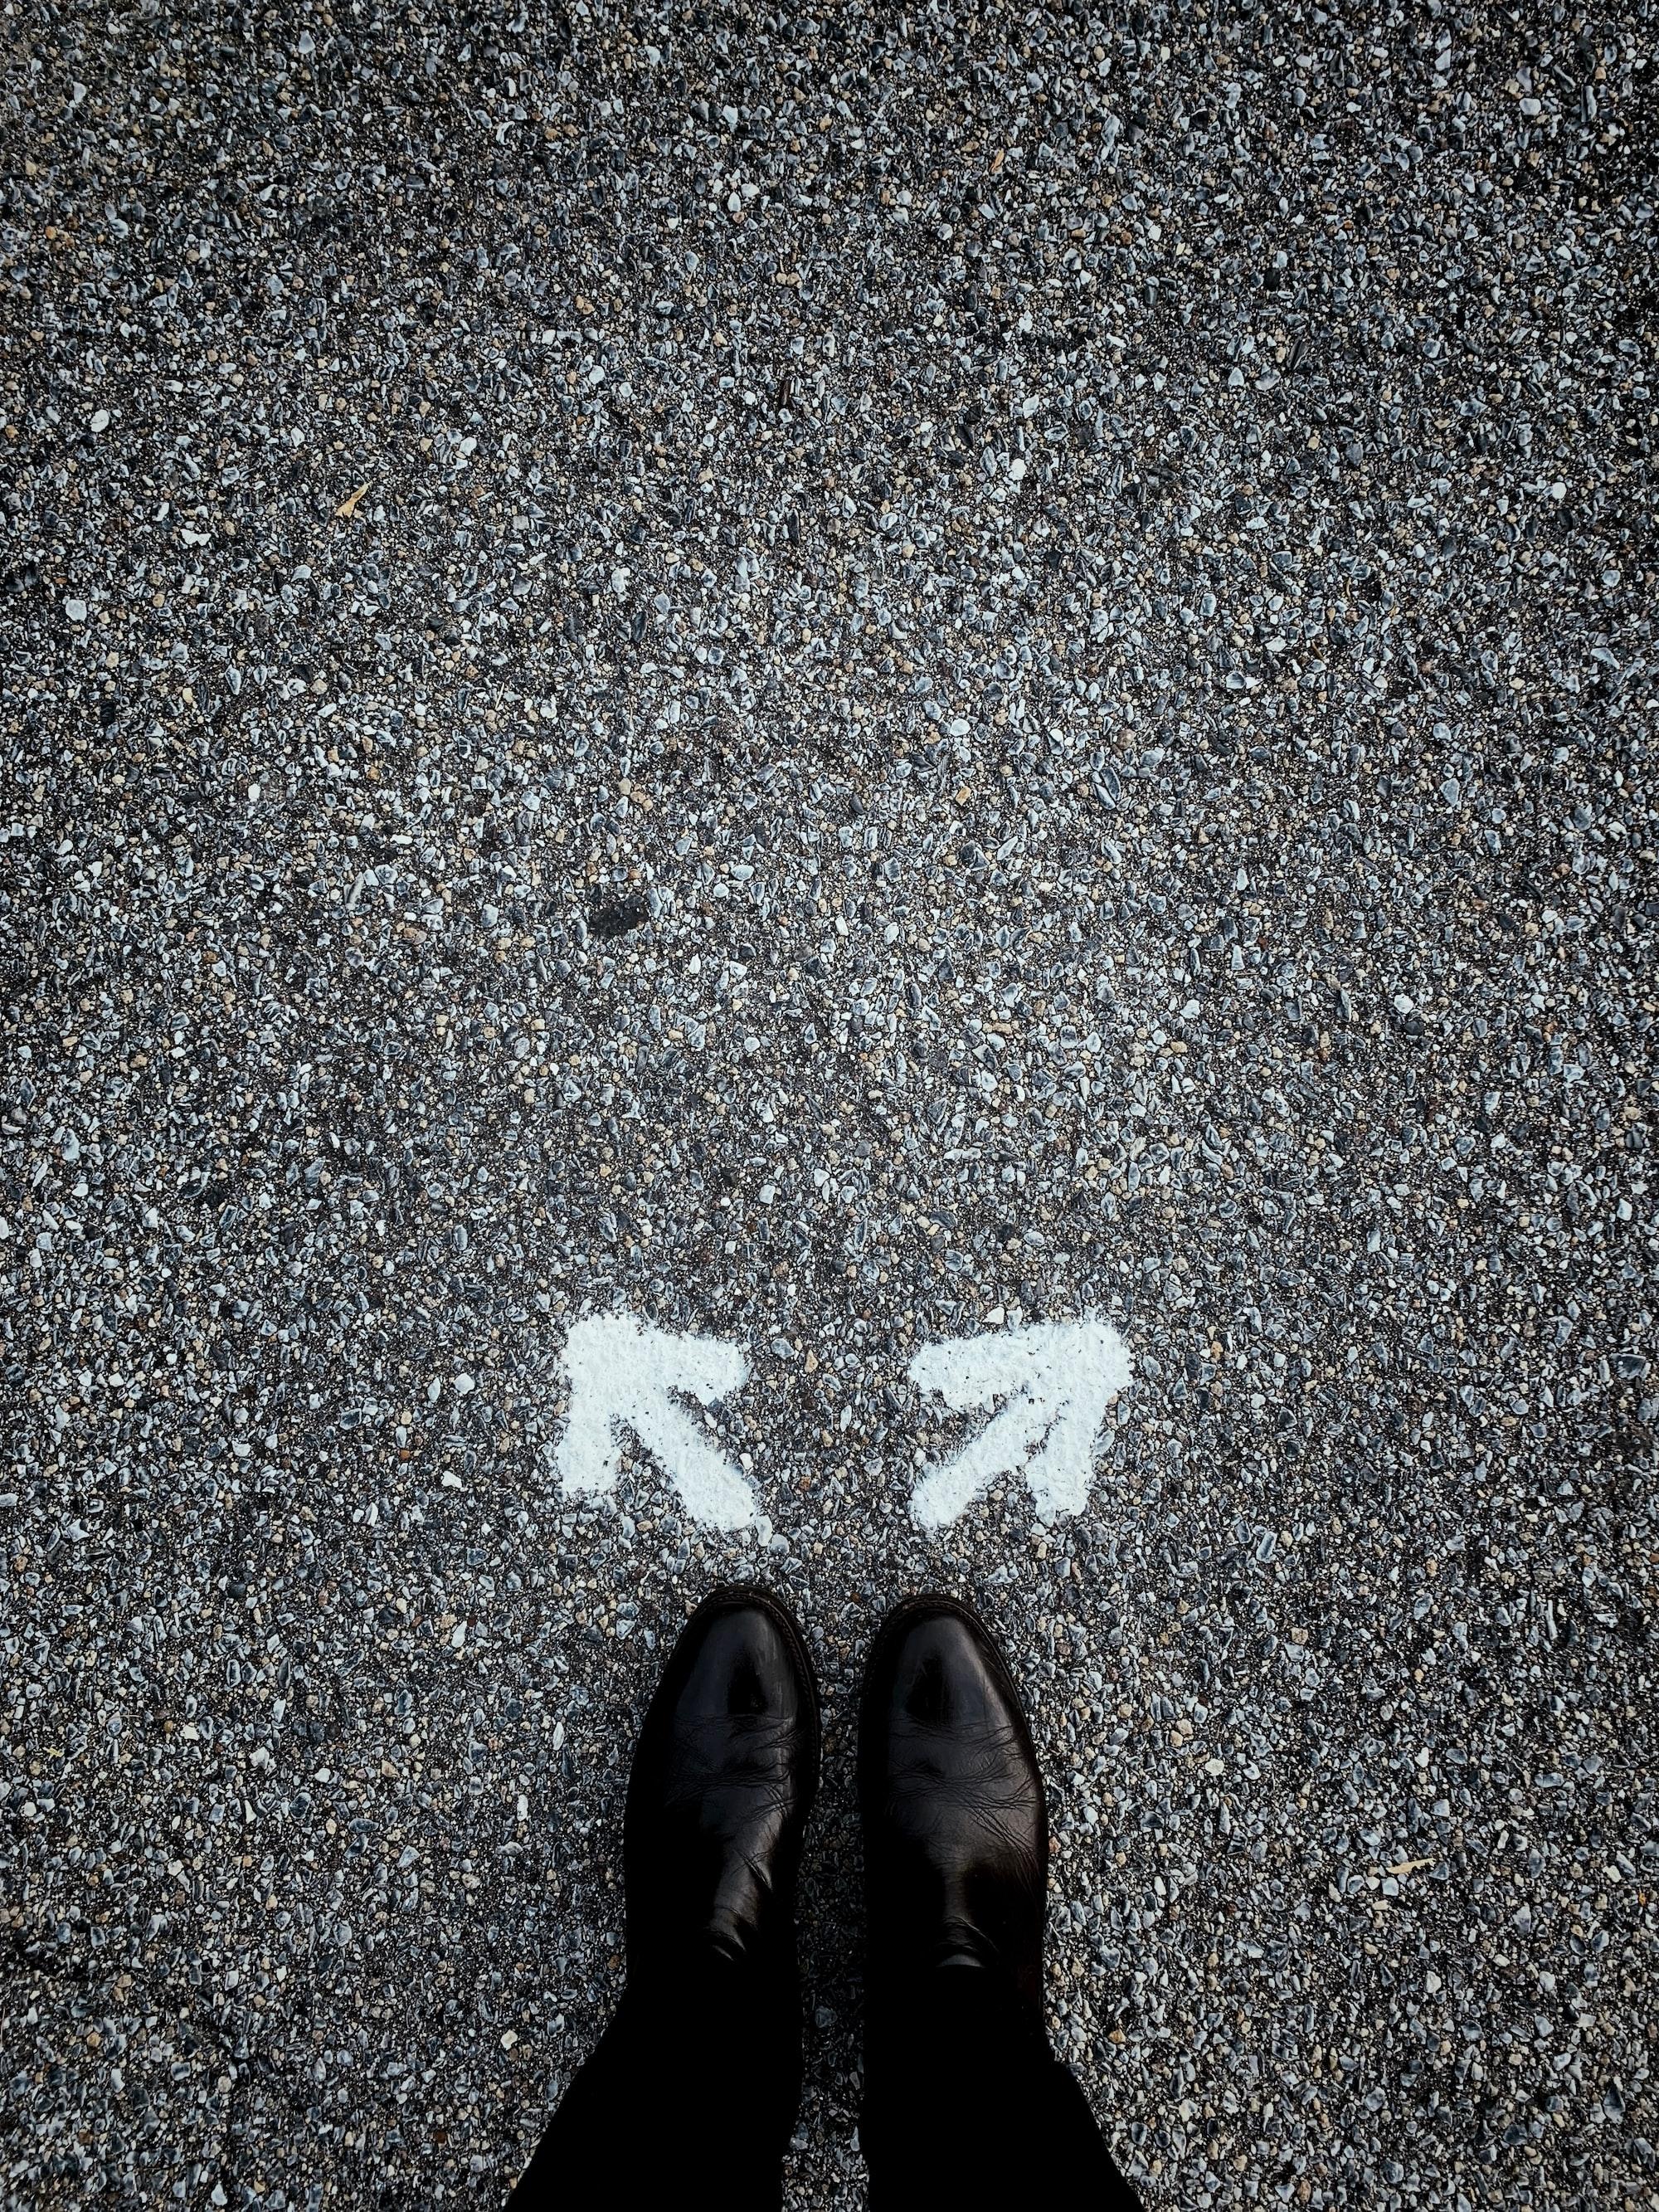 Do we need to use both progress and score?